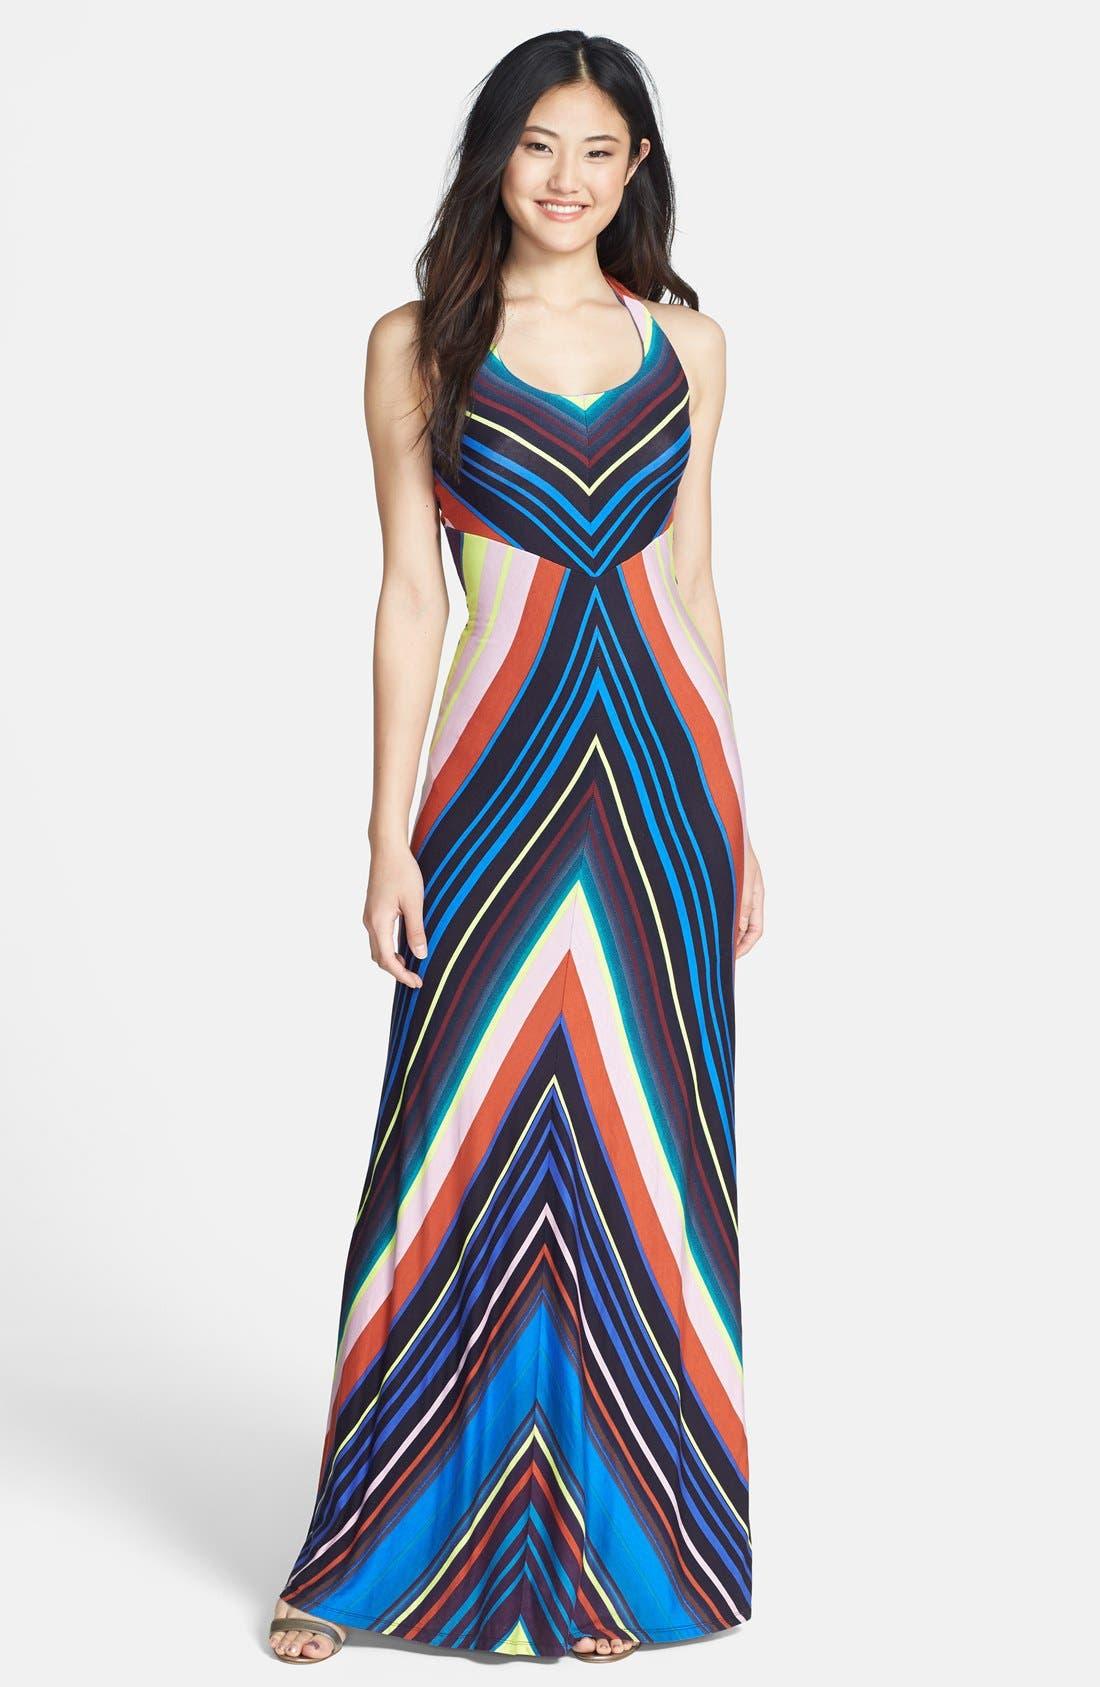 Alternate Image 1 Selected - Felicity & Coco Stripe Jersey Halter Dress (Regular & Petite) (Nordstrom Exclusive)